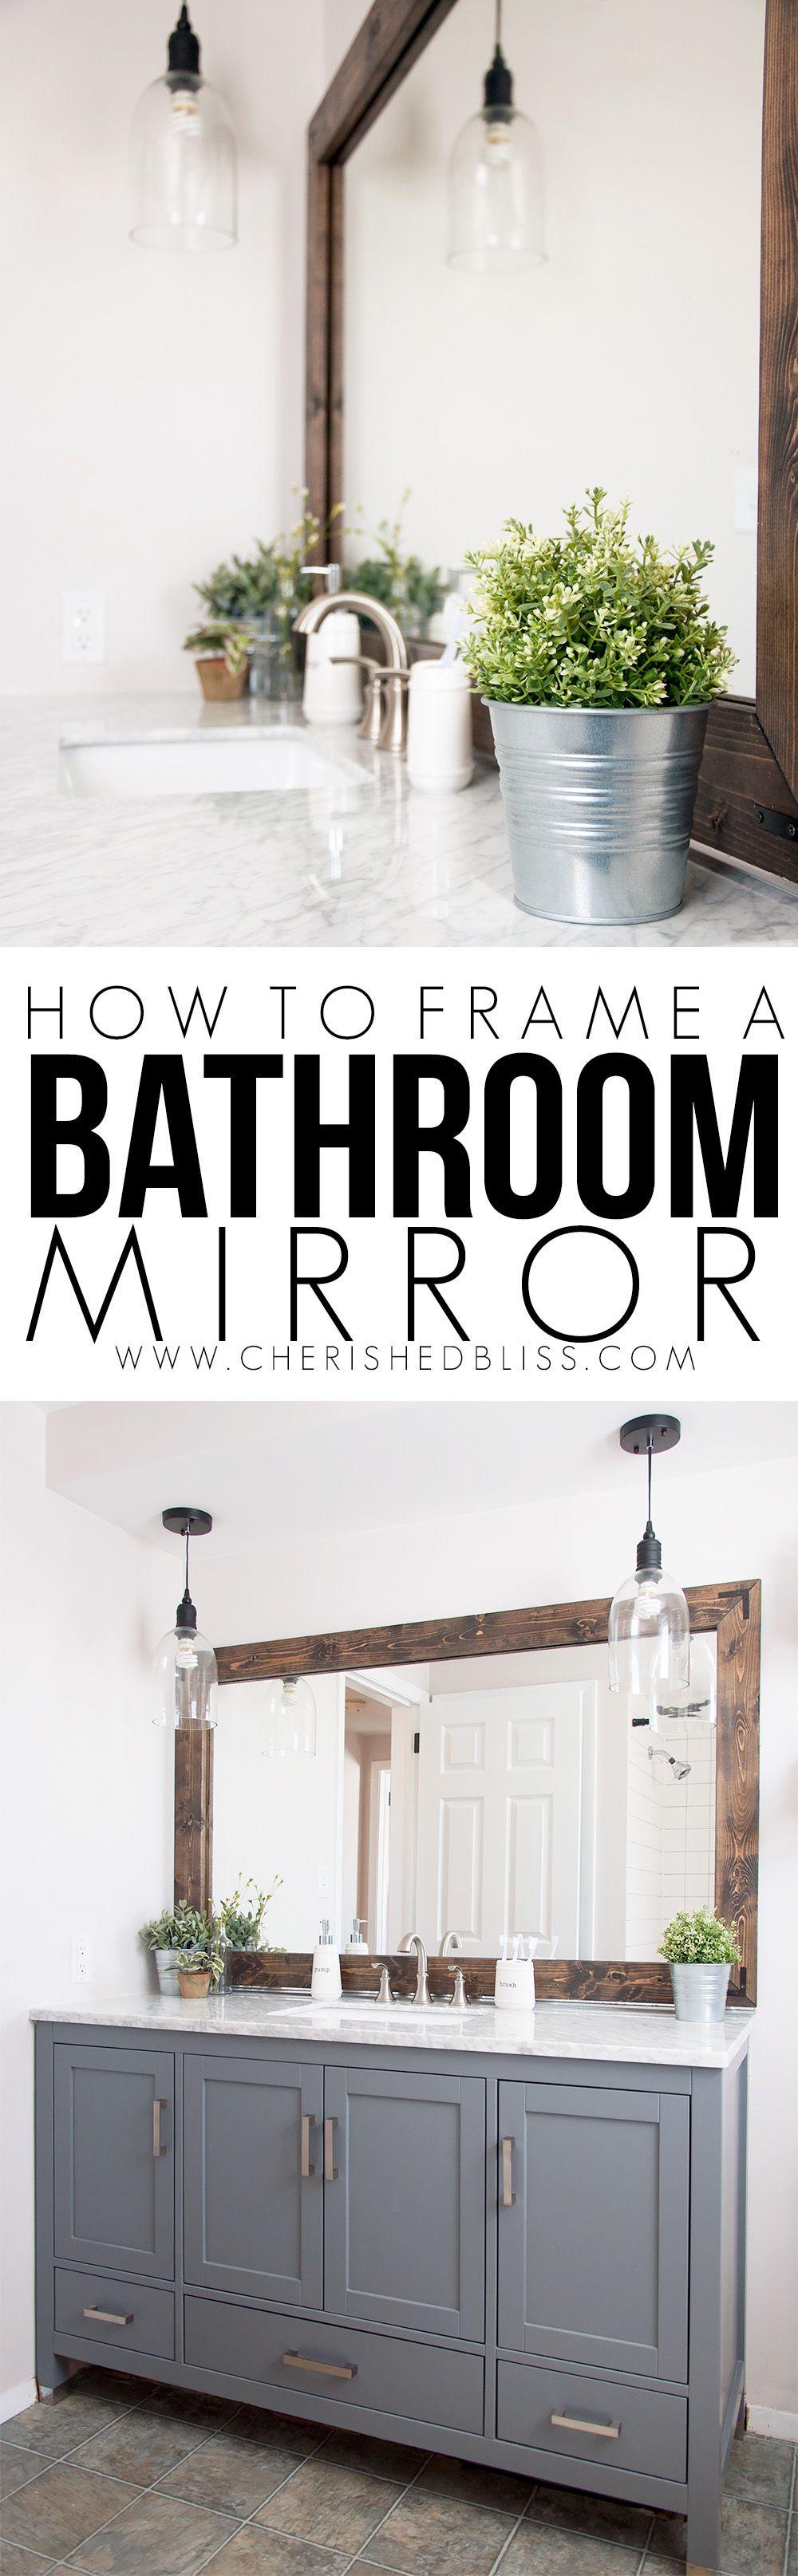 How To Frame A Bathroom Mirror  Bathroom Mirrors Tutorials And Easy Prepossessing A Bathroom 2018